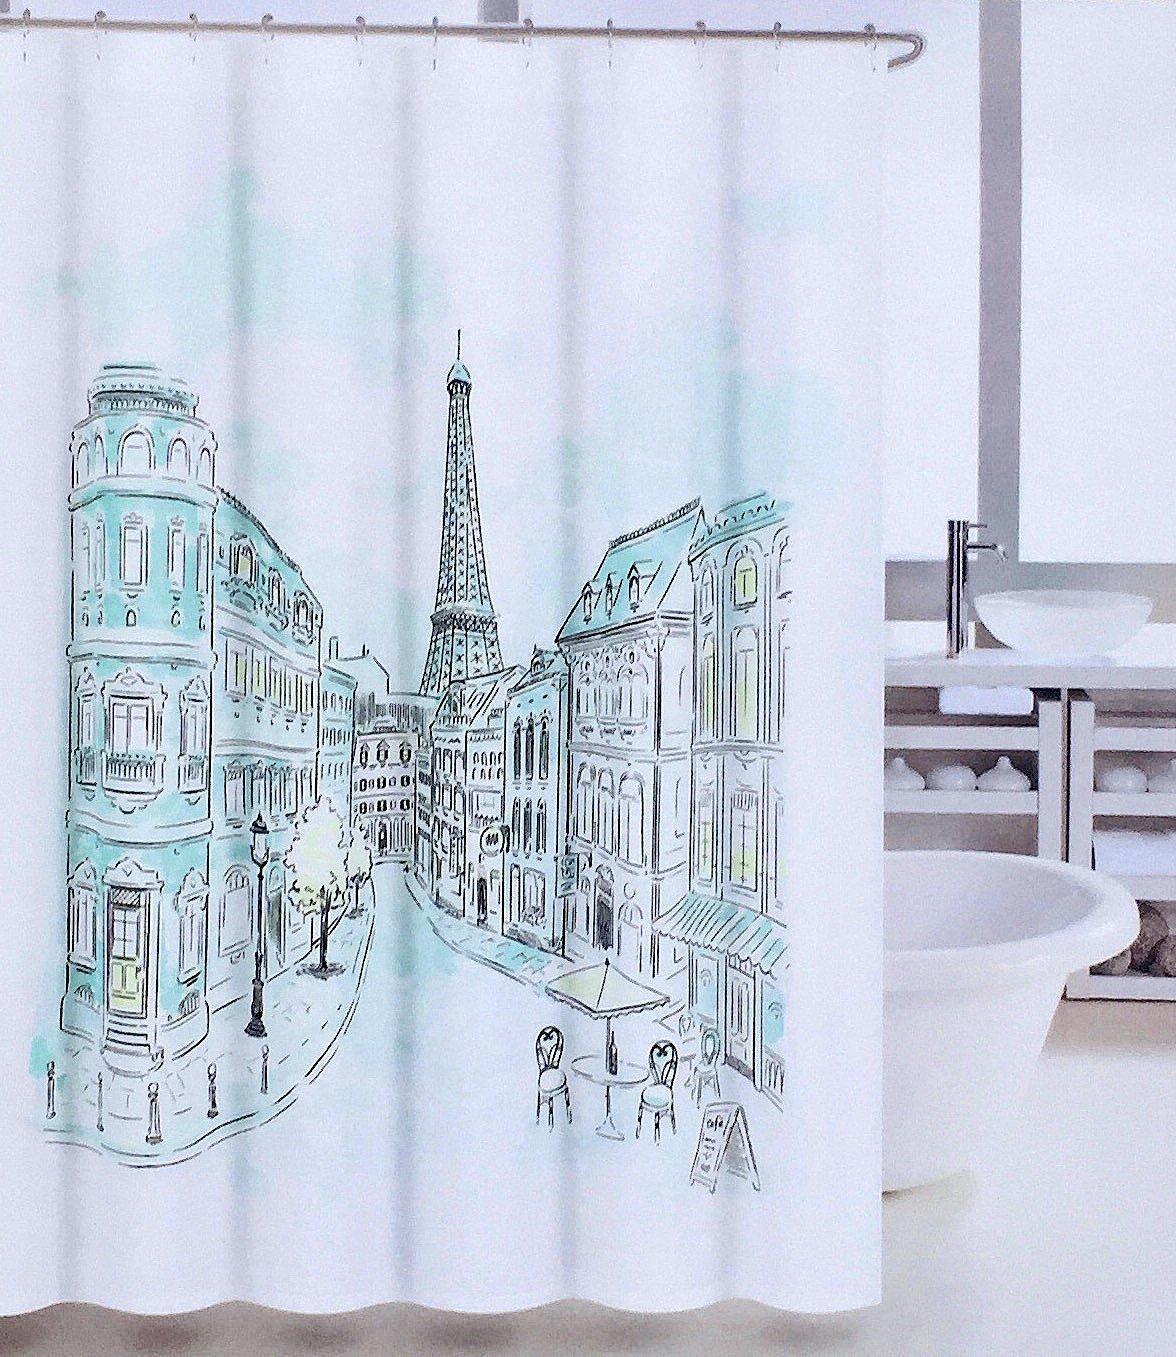 Amazon.com: Tahari Paris Street in Color Fabric Shower Curtain with ...